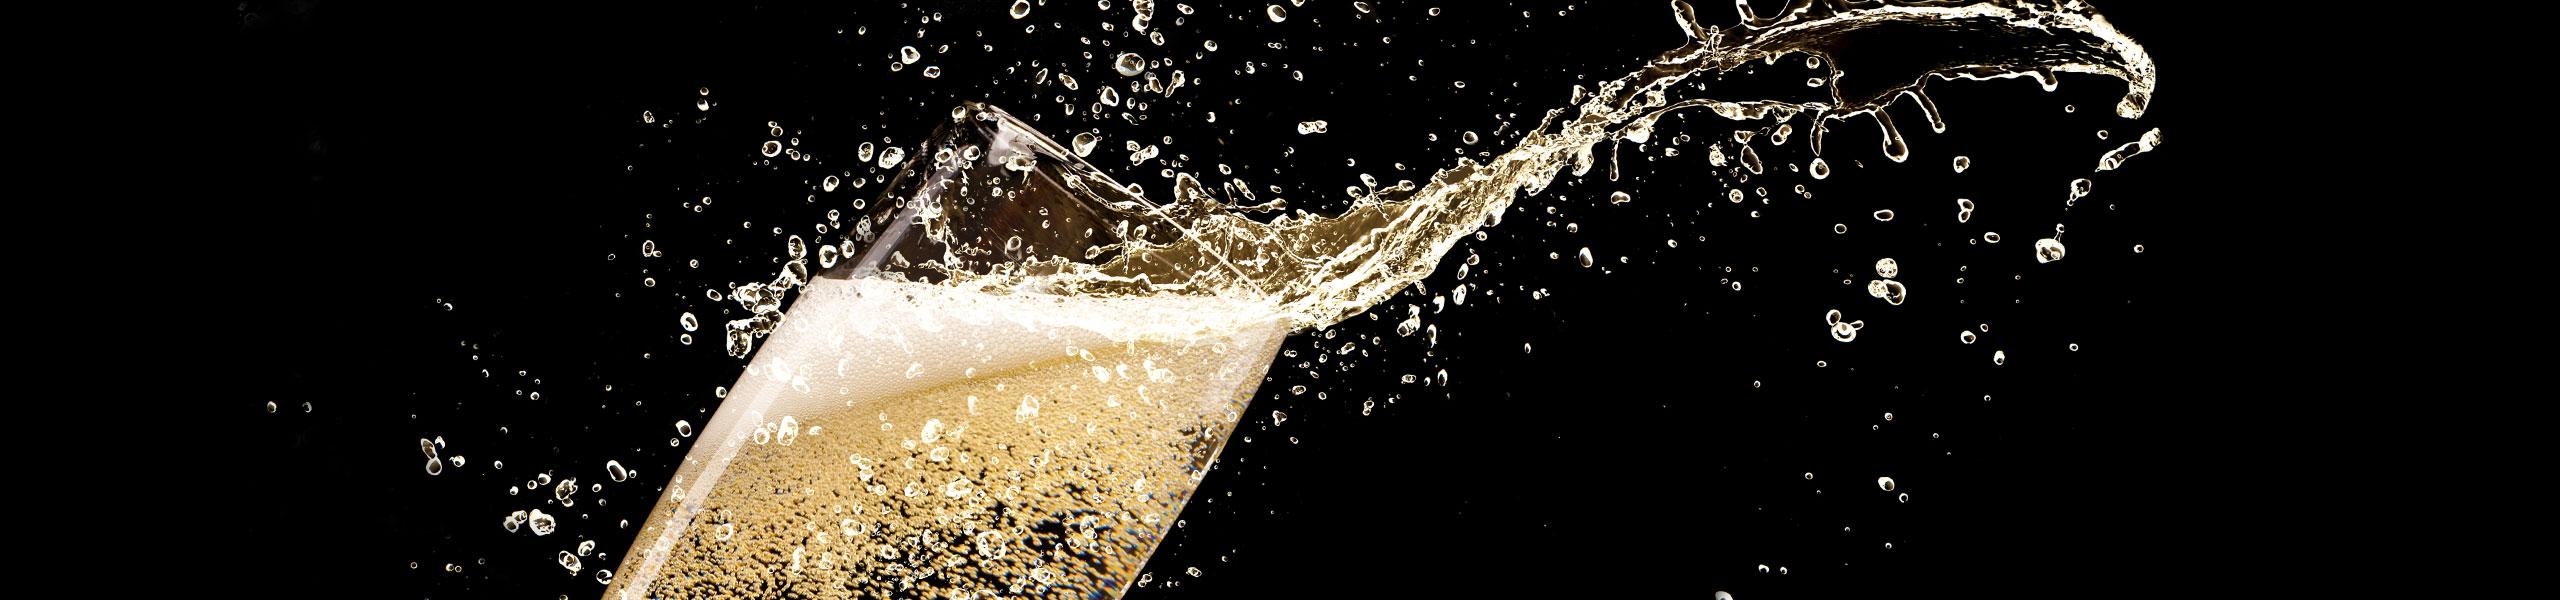 sparkling wine champagne